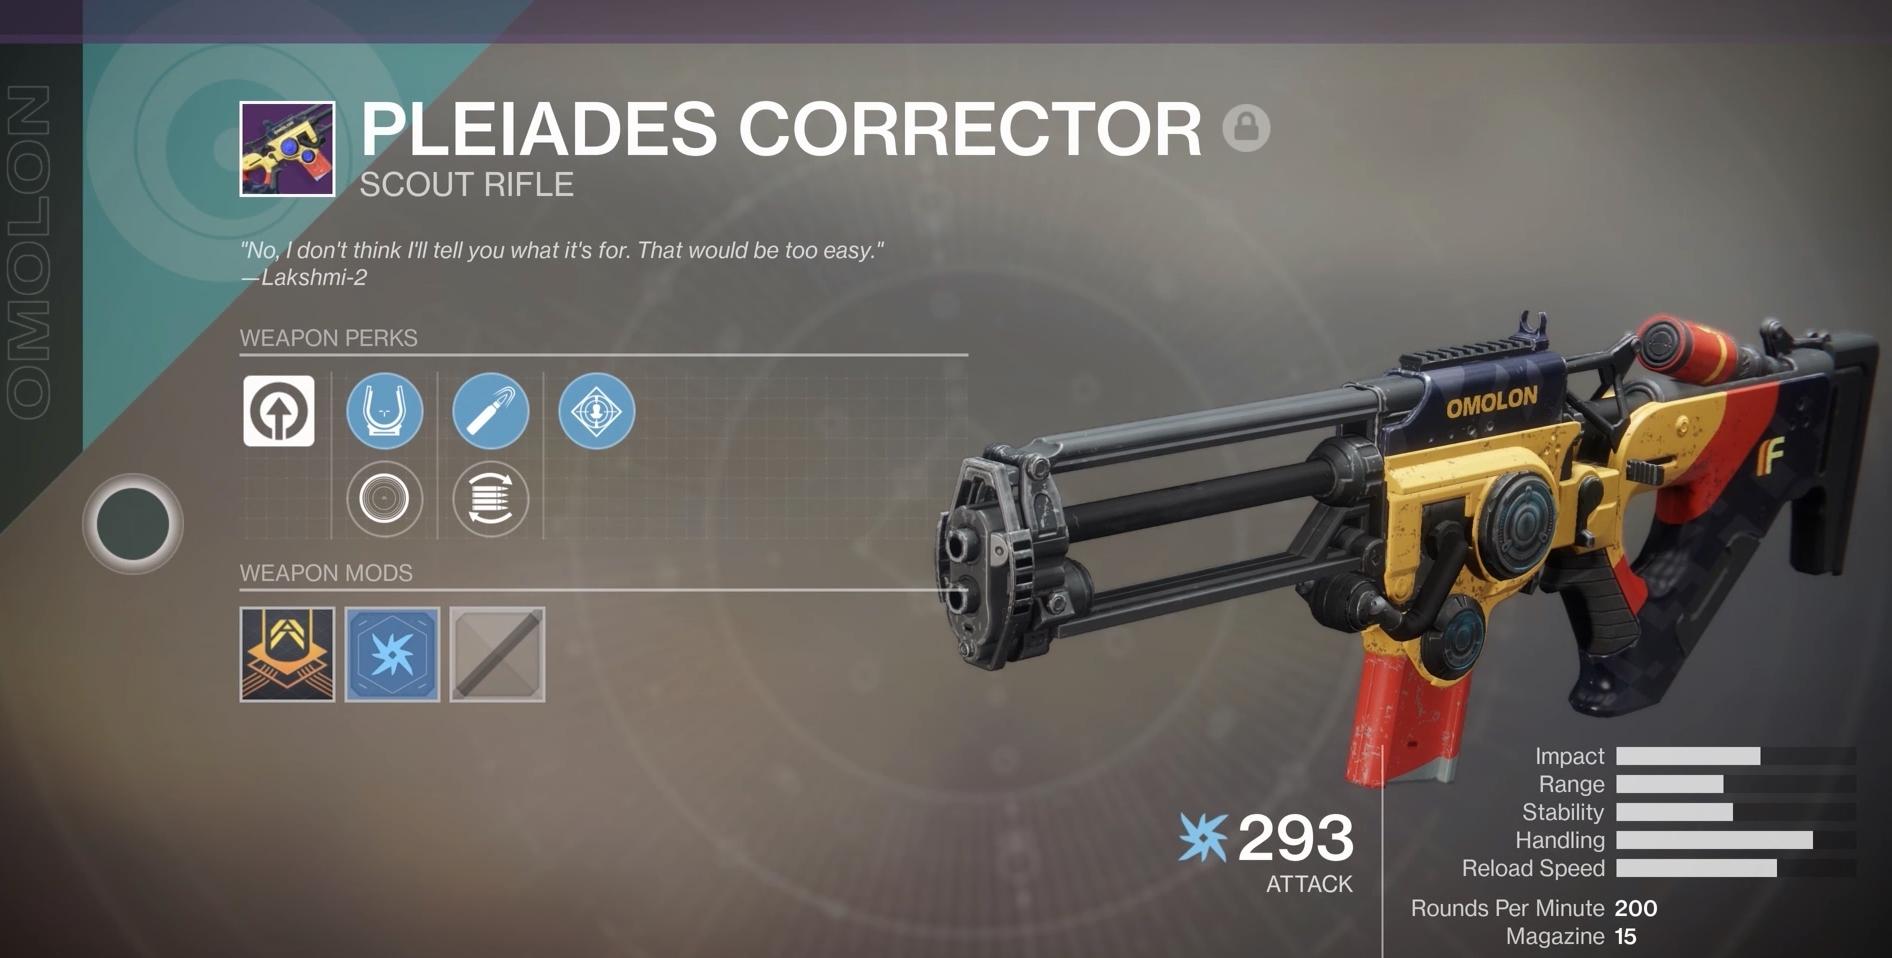 pleiades_corrector_destiny_2_capture_1